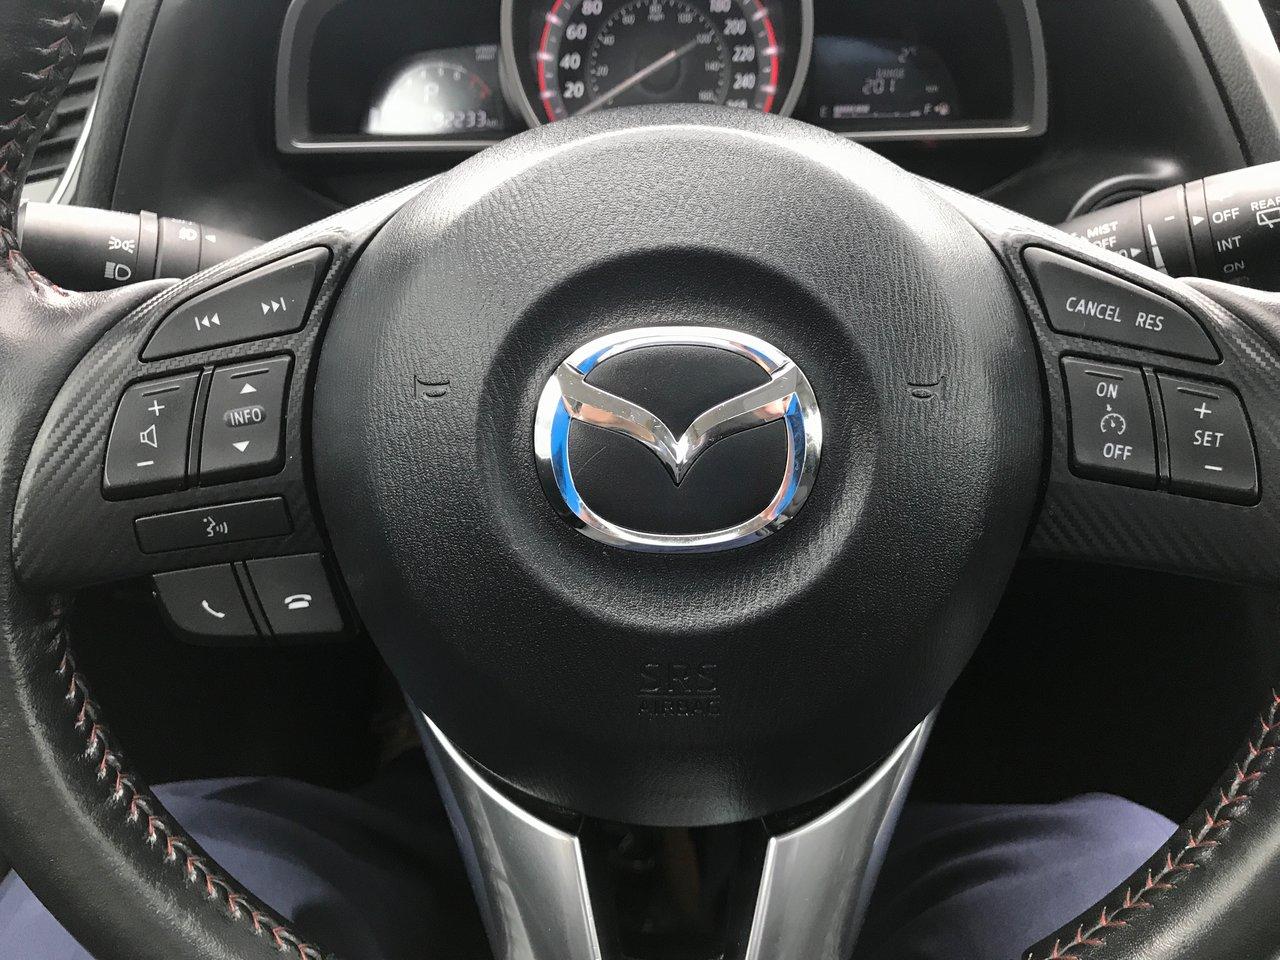 Photo 2014 Mazda 3 Sport SUNROOF! HEATED SEATS! $53/WK TAX IN!!! SUNROOF! HEATED SEATS! $53/WK TAX IN!!!